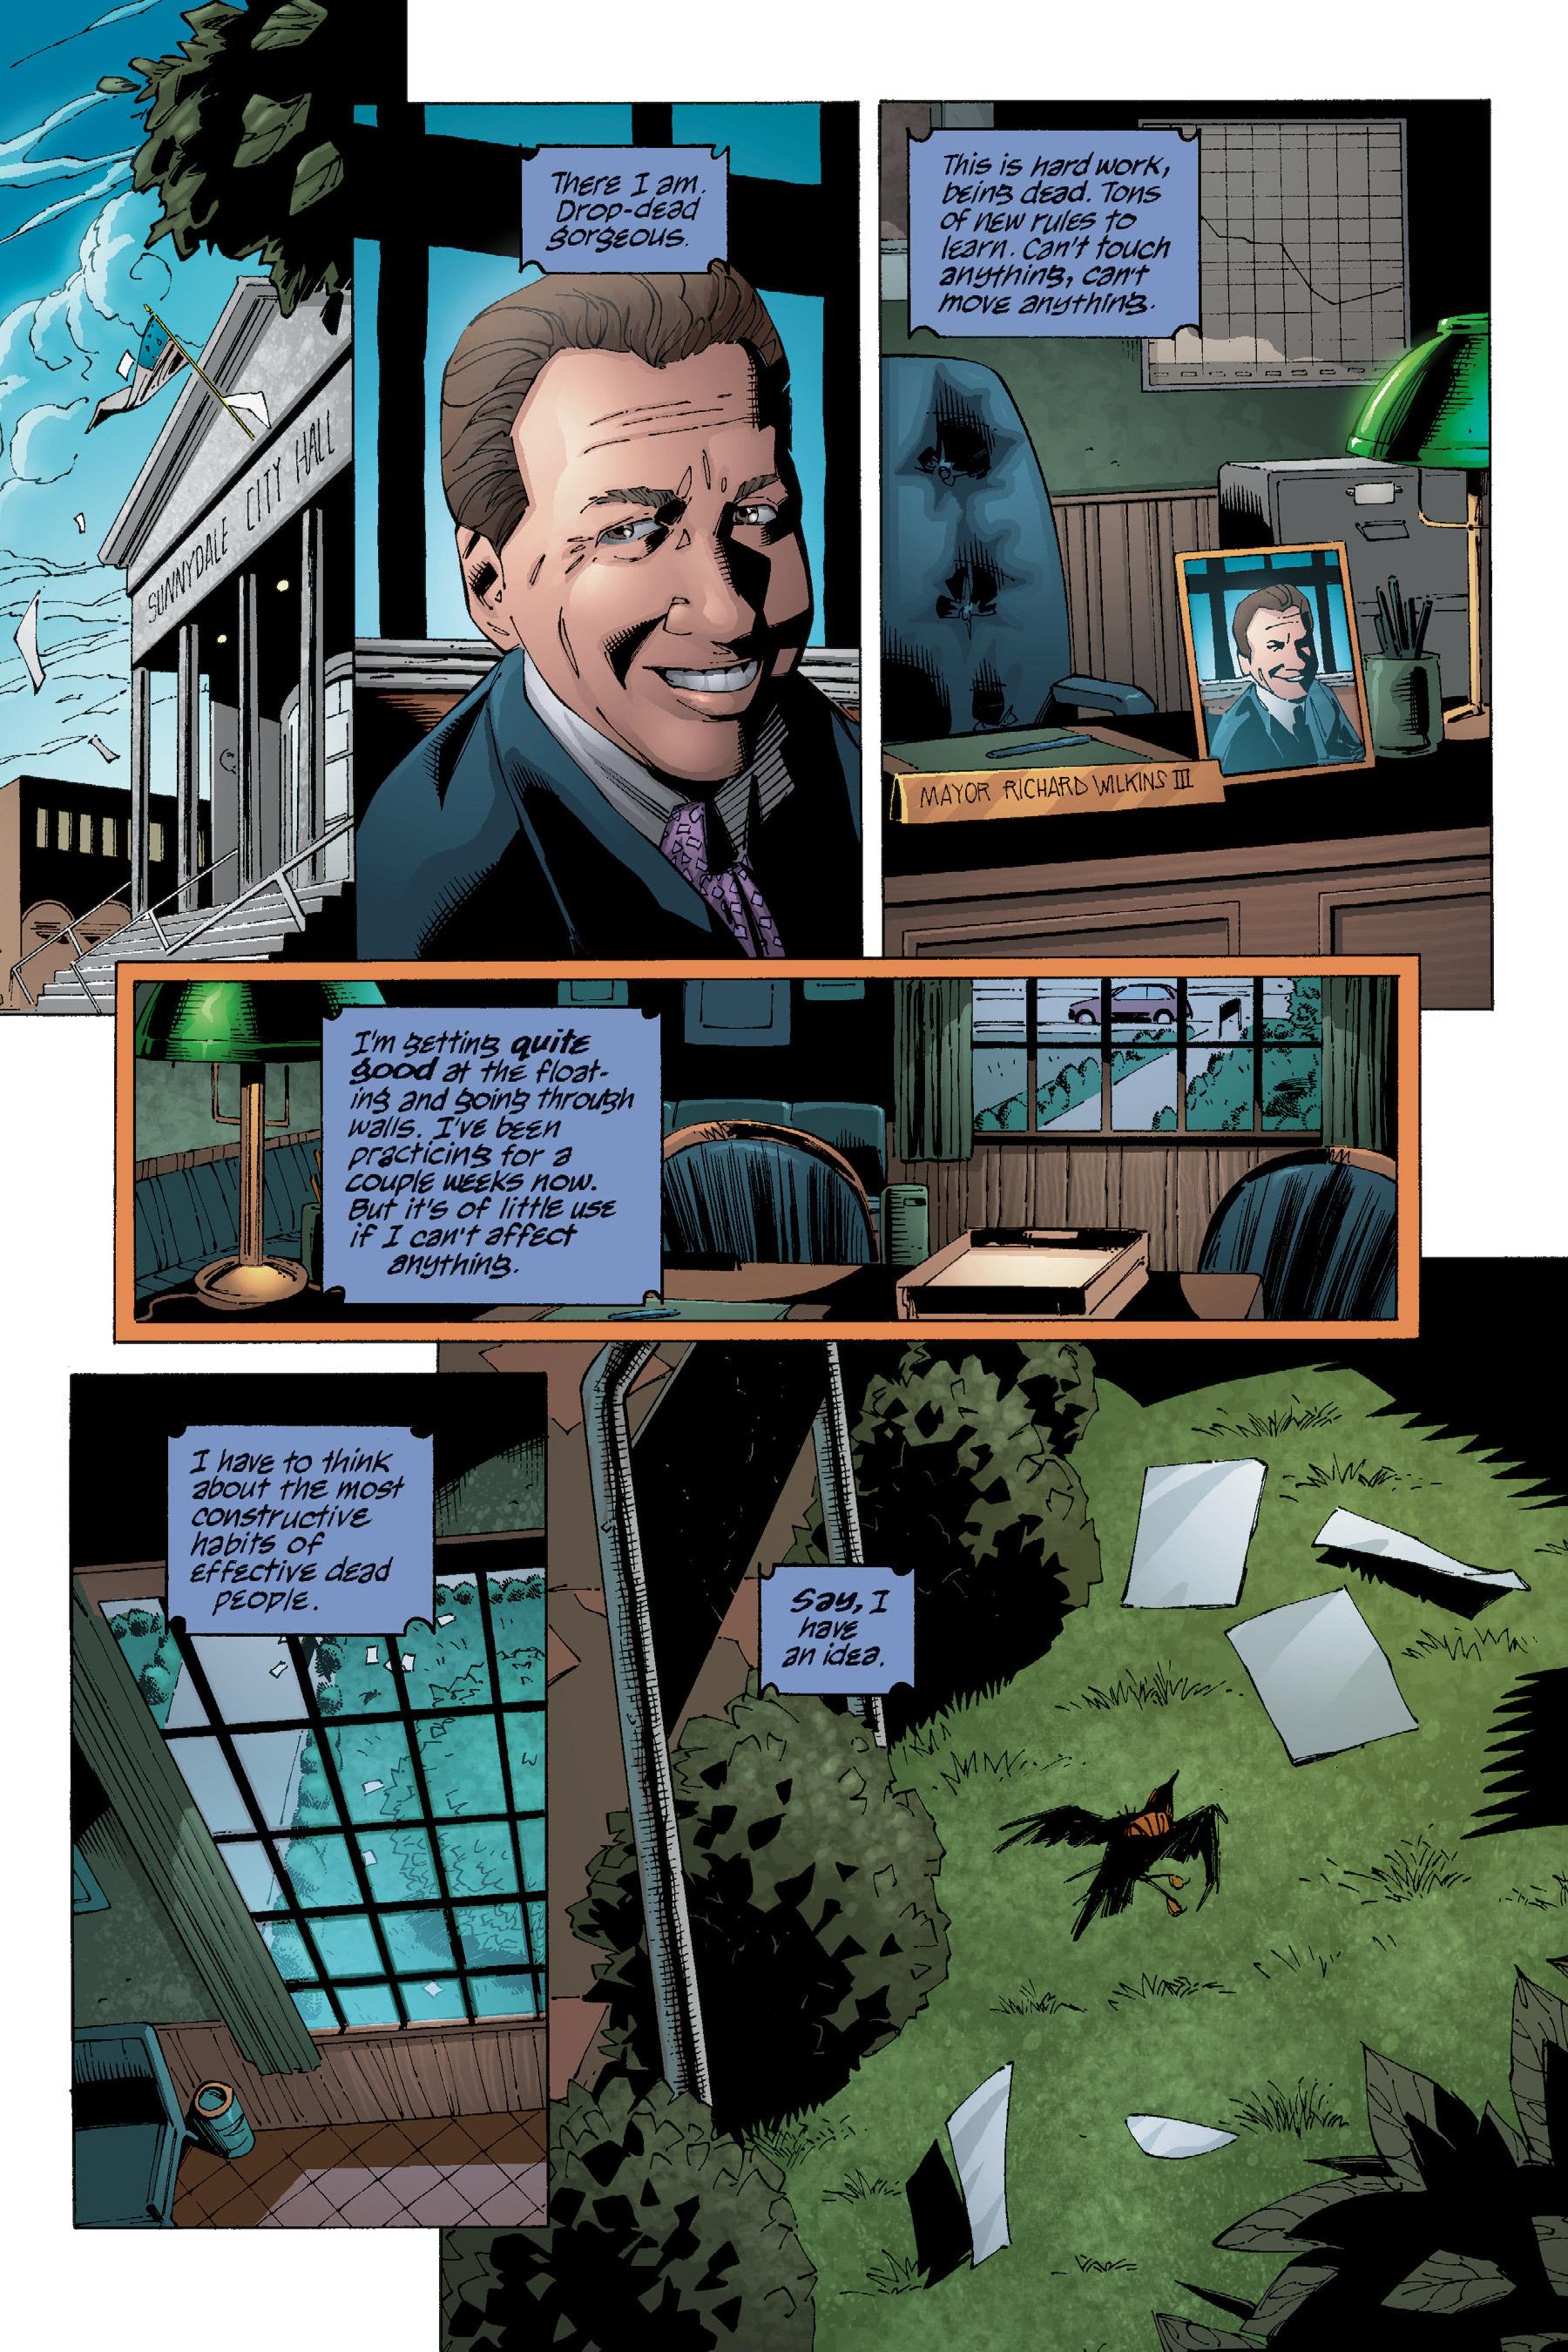 Read online Buffy the Vampire Slayer: Omnibus comic -  Issue # TPB 5 - 16